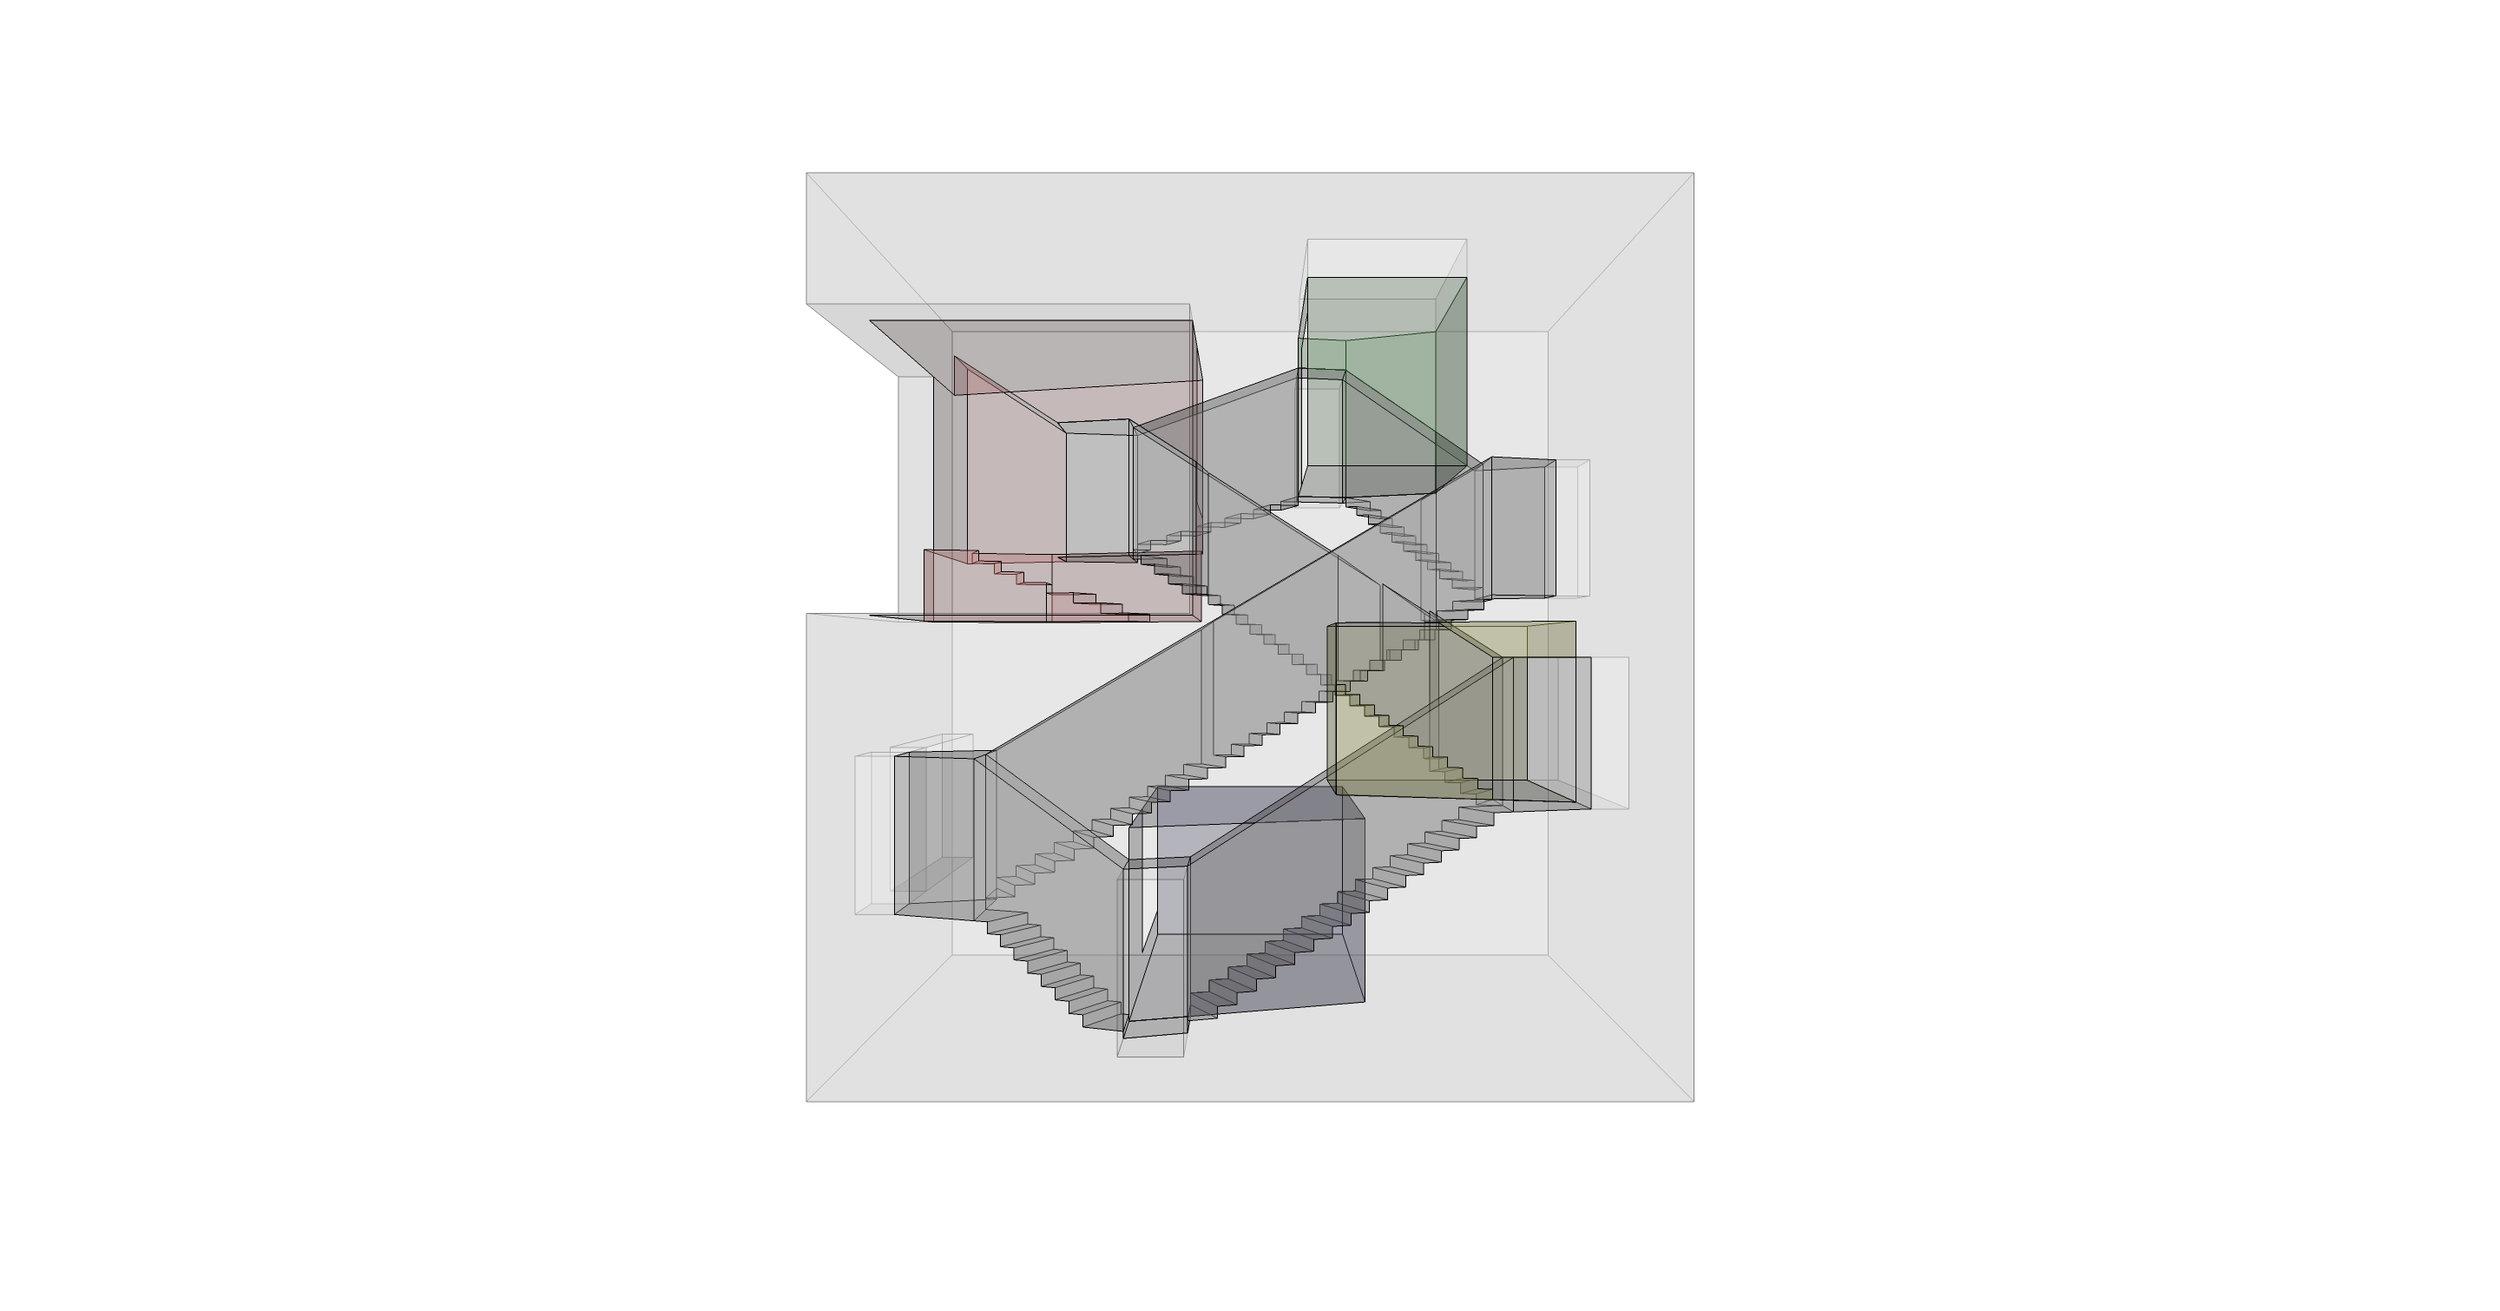 08_Rossitch_Billiards_Circulation+Space.jpg